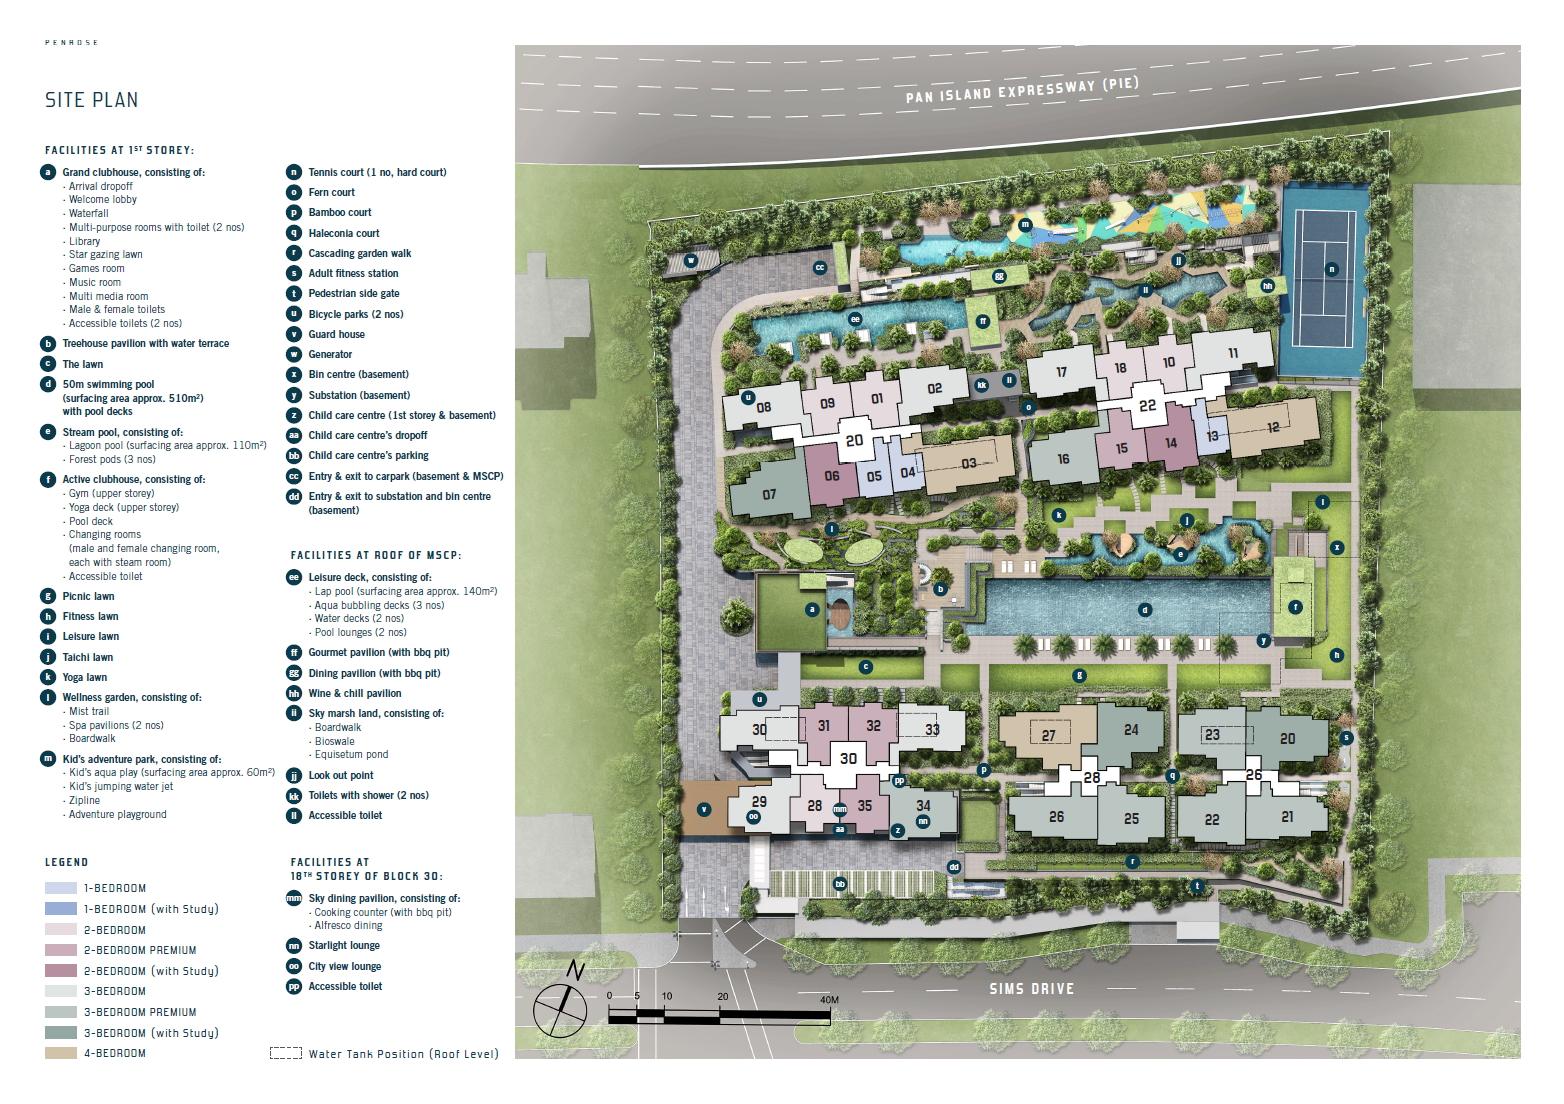 Penrose (D14) site plan